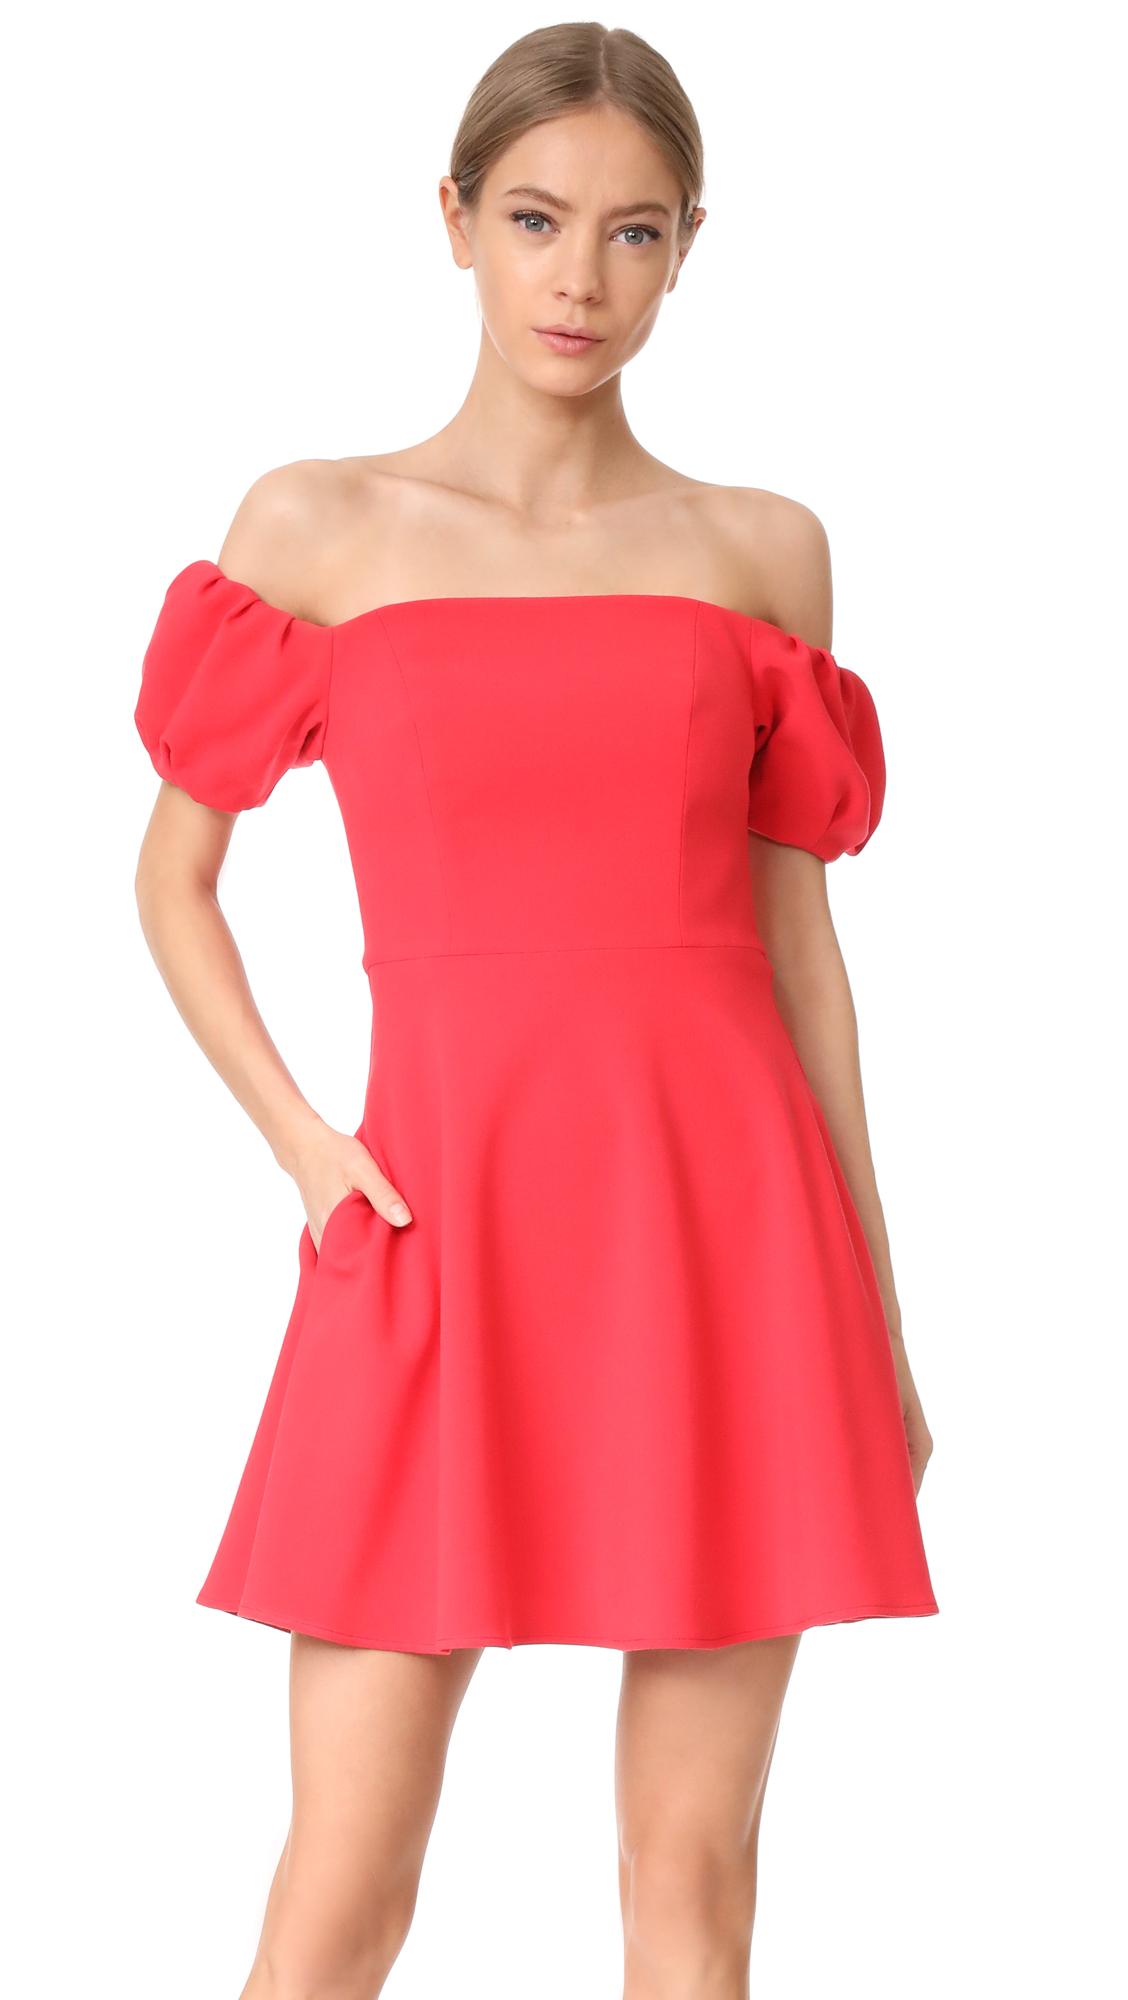 Black Halo Arden Mini Dress - Chic Red